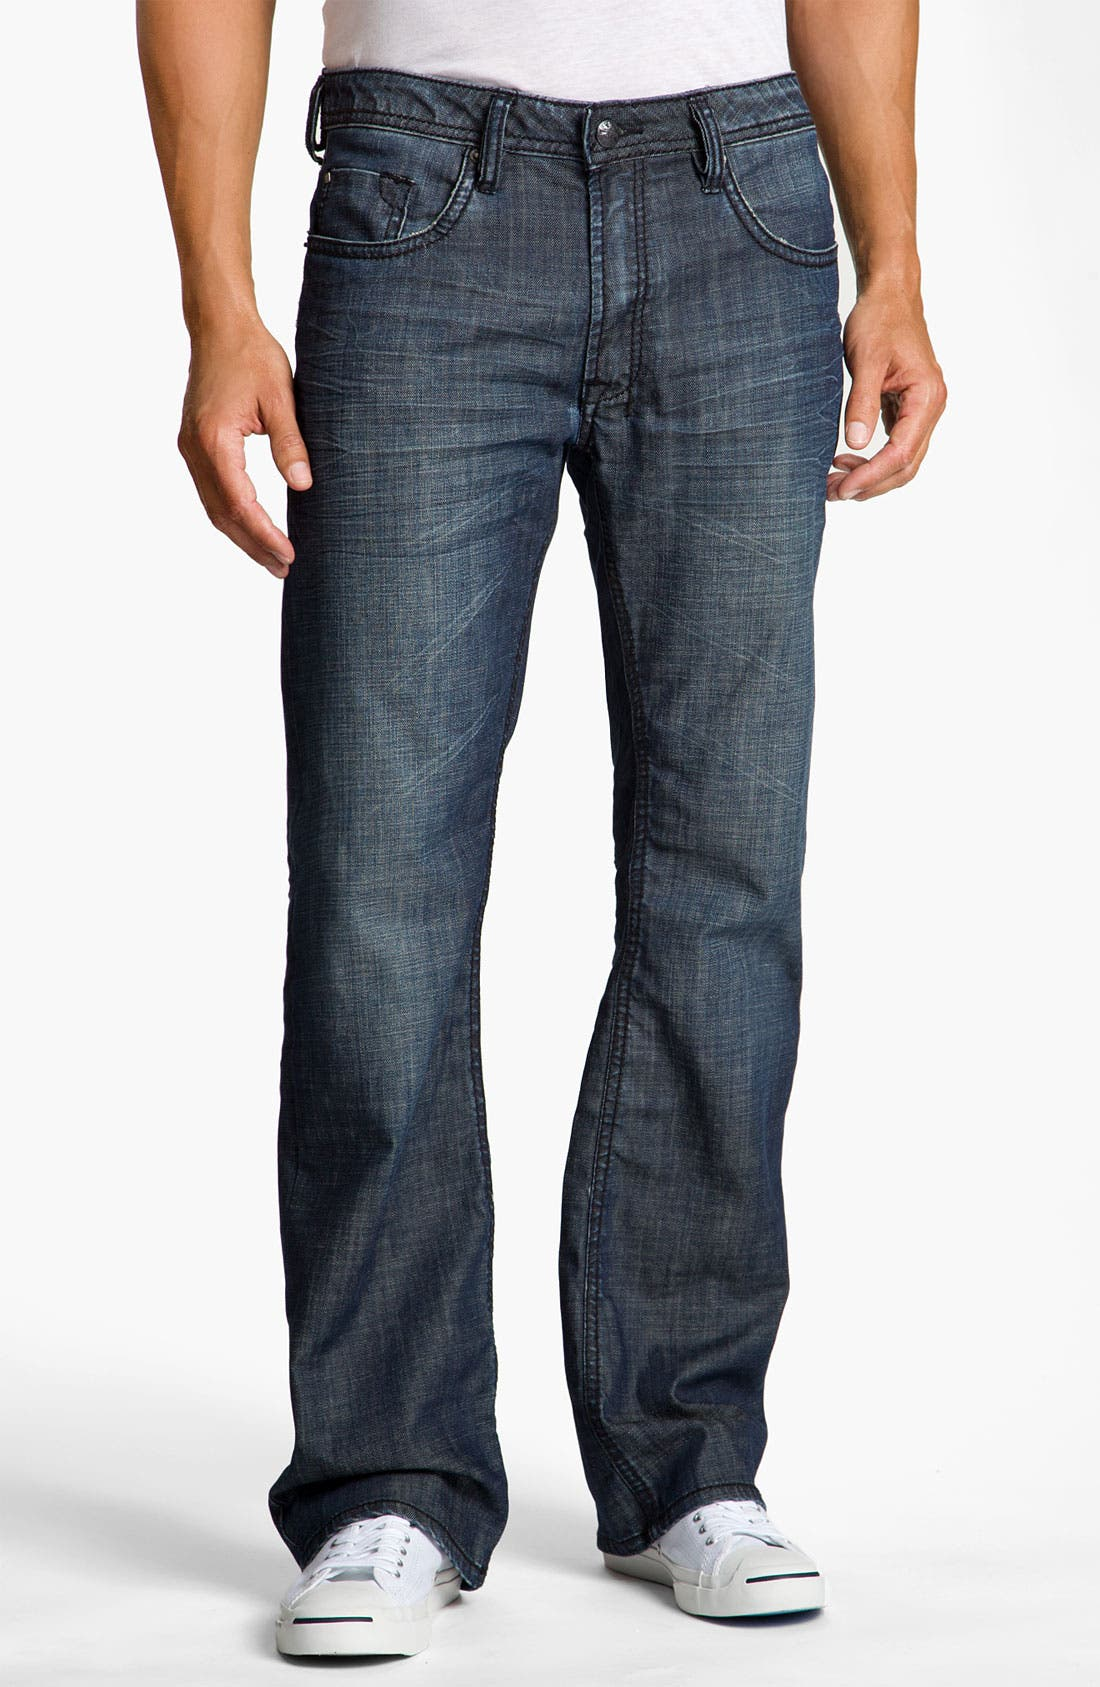 Alternate Image 1 Selected - Buffalo Jeans 'Driven' Straight Leg Jeans (Vintage Stone)